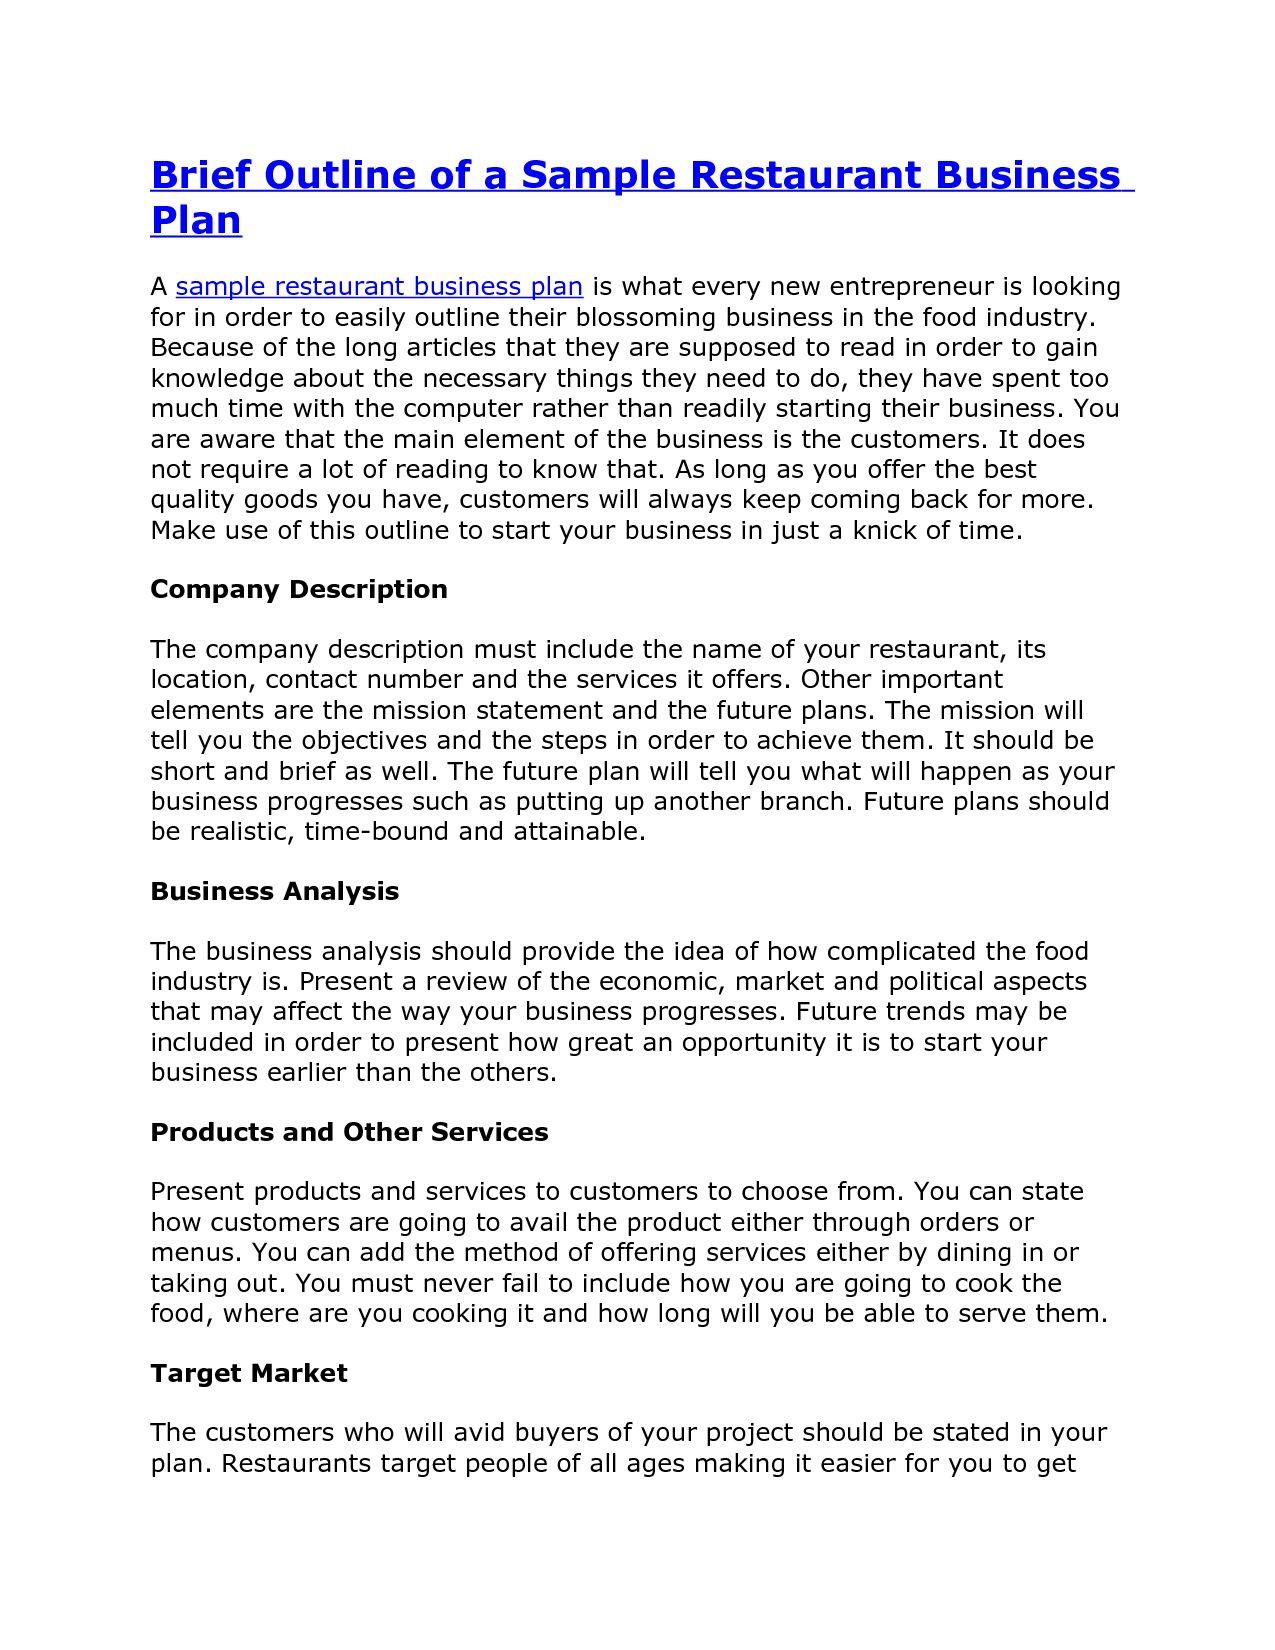 Business Plan Startup Template Startup Business Plan Templates 15 With Start Simple Business Plan Template Startup Business Plan Startup Business Plan Template